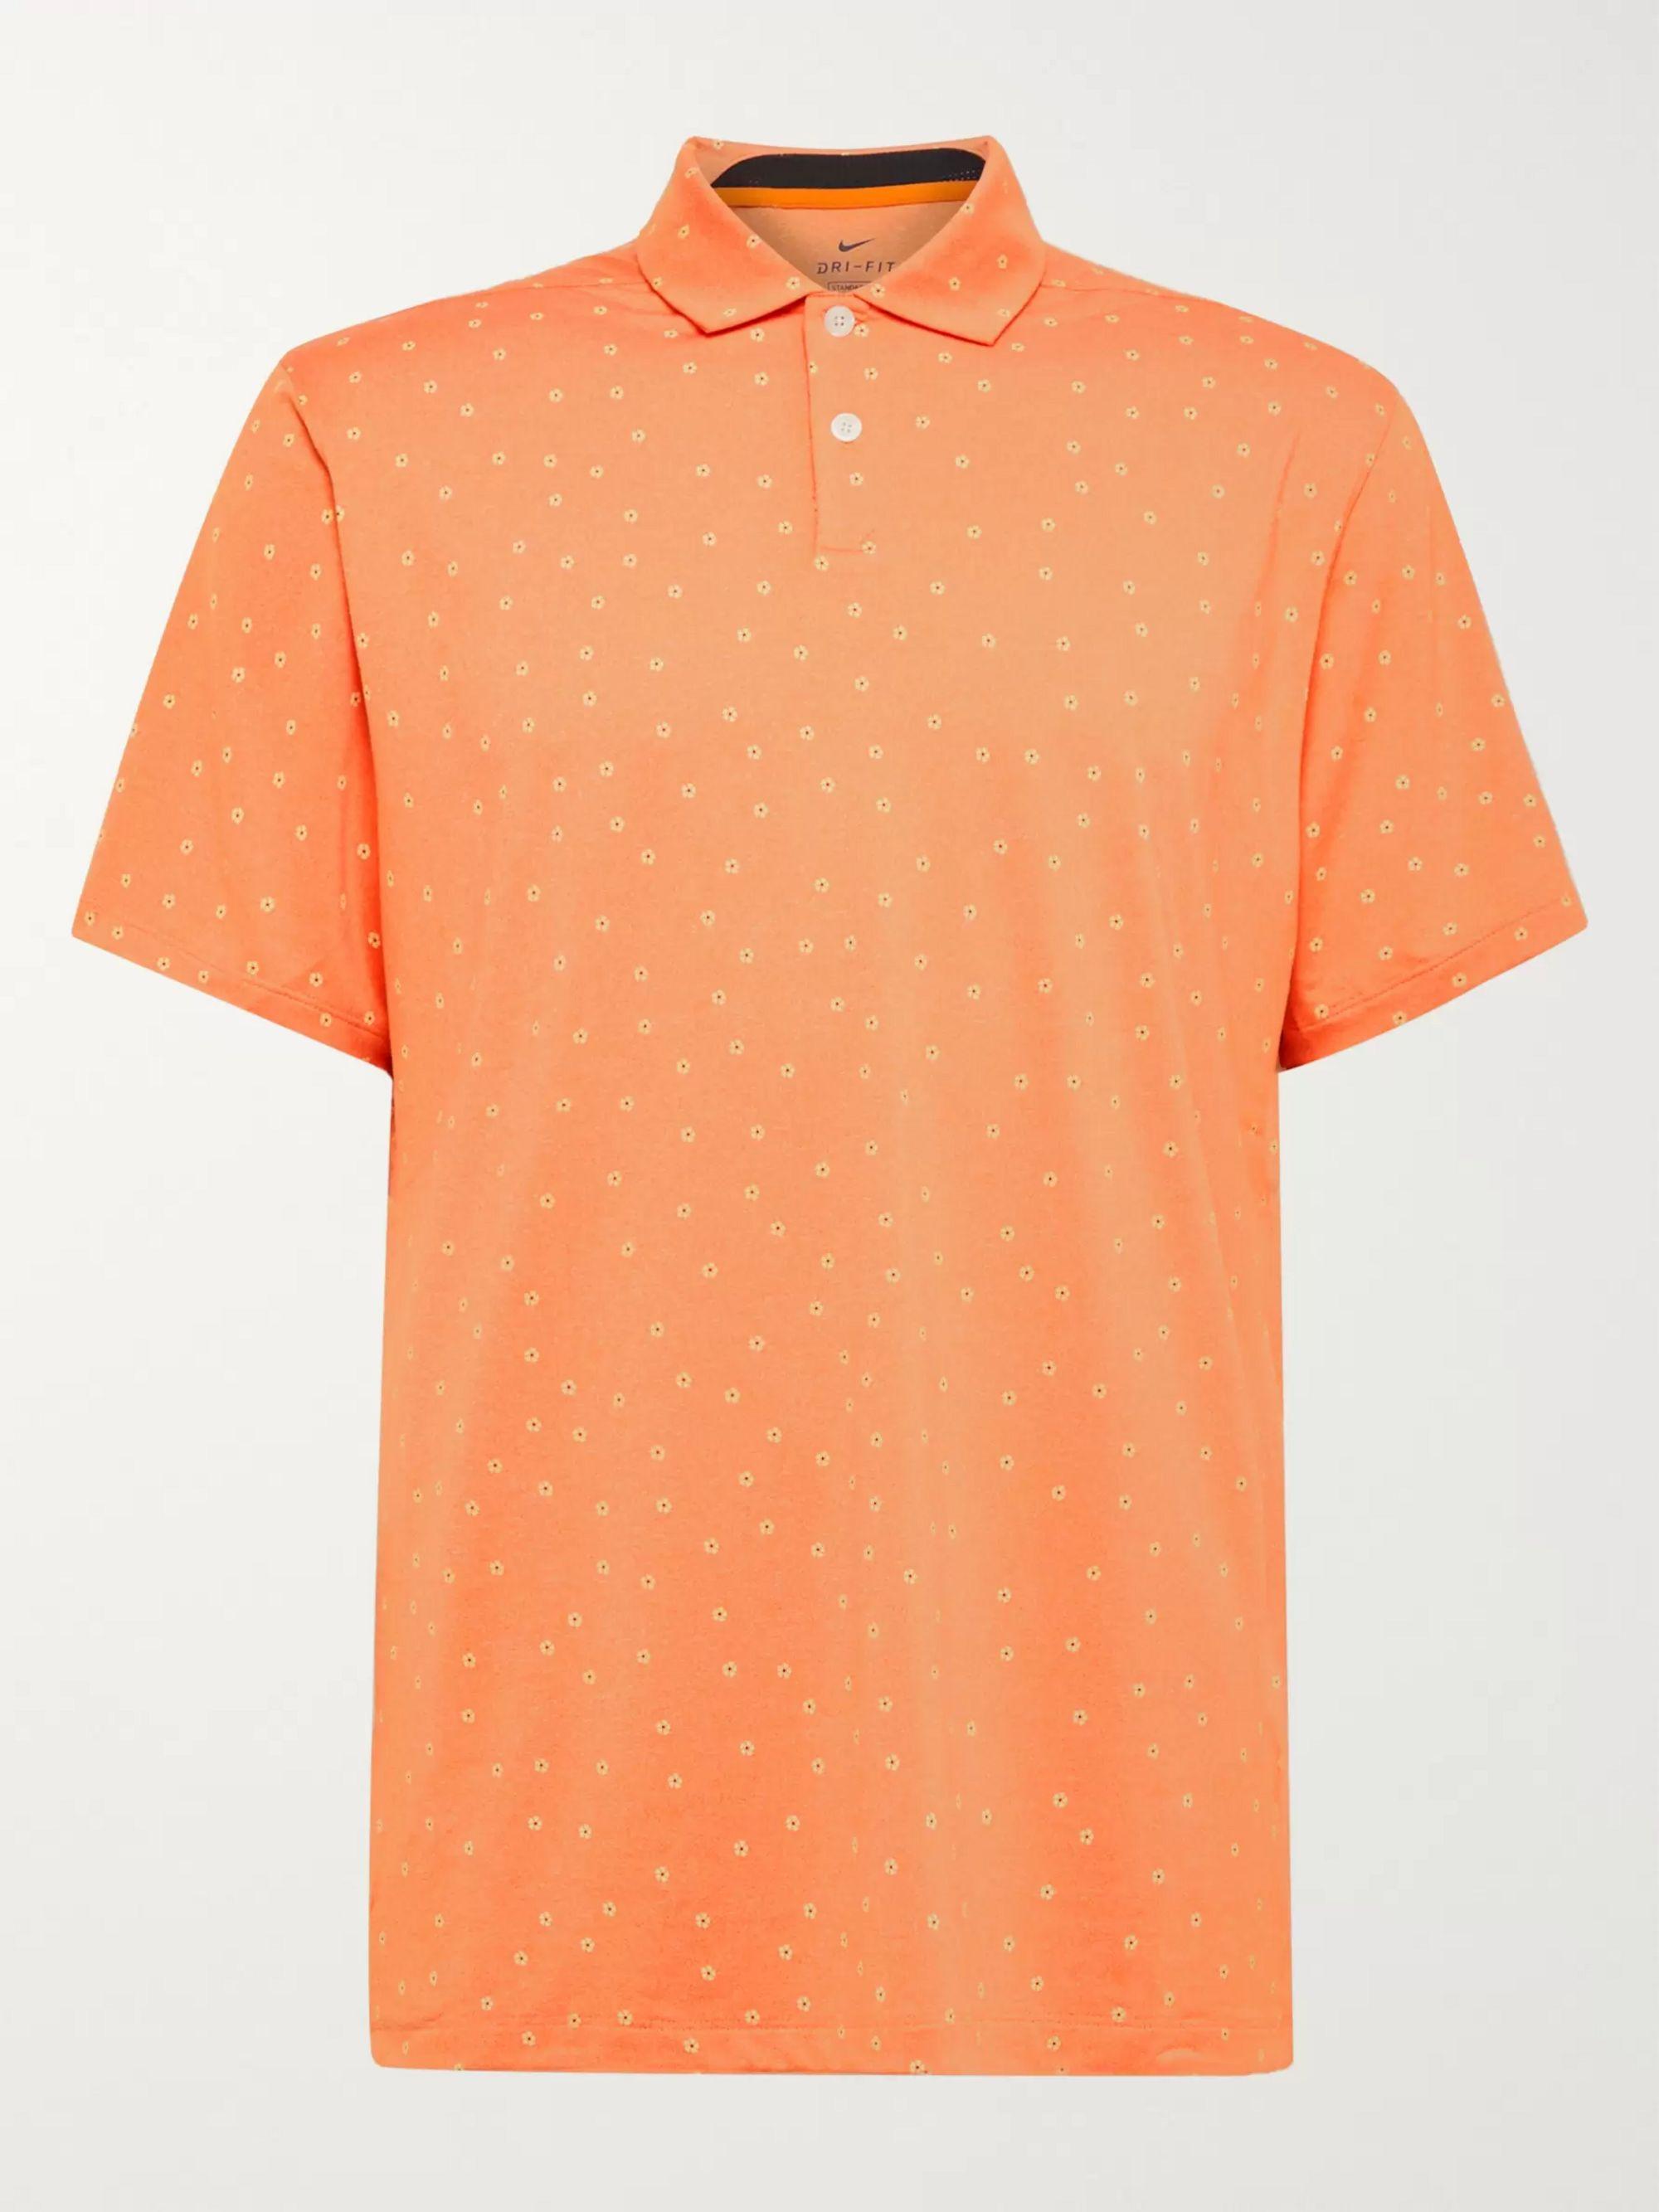 Nike Golf Vapor Printed Dri-FIT Polo Shirt